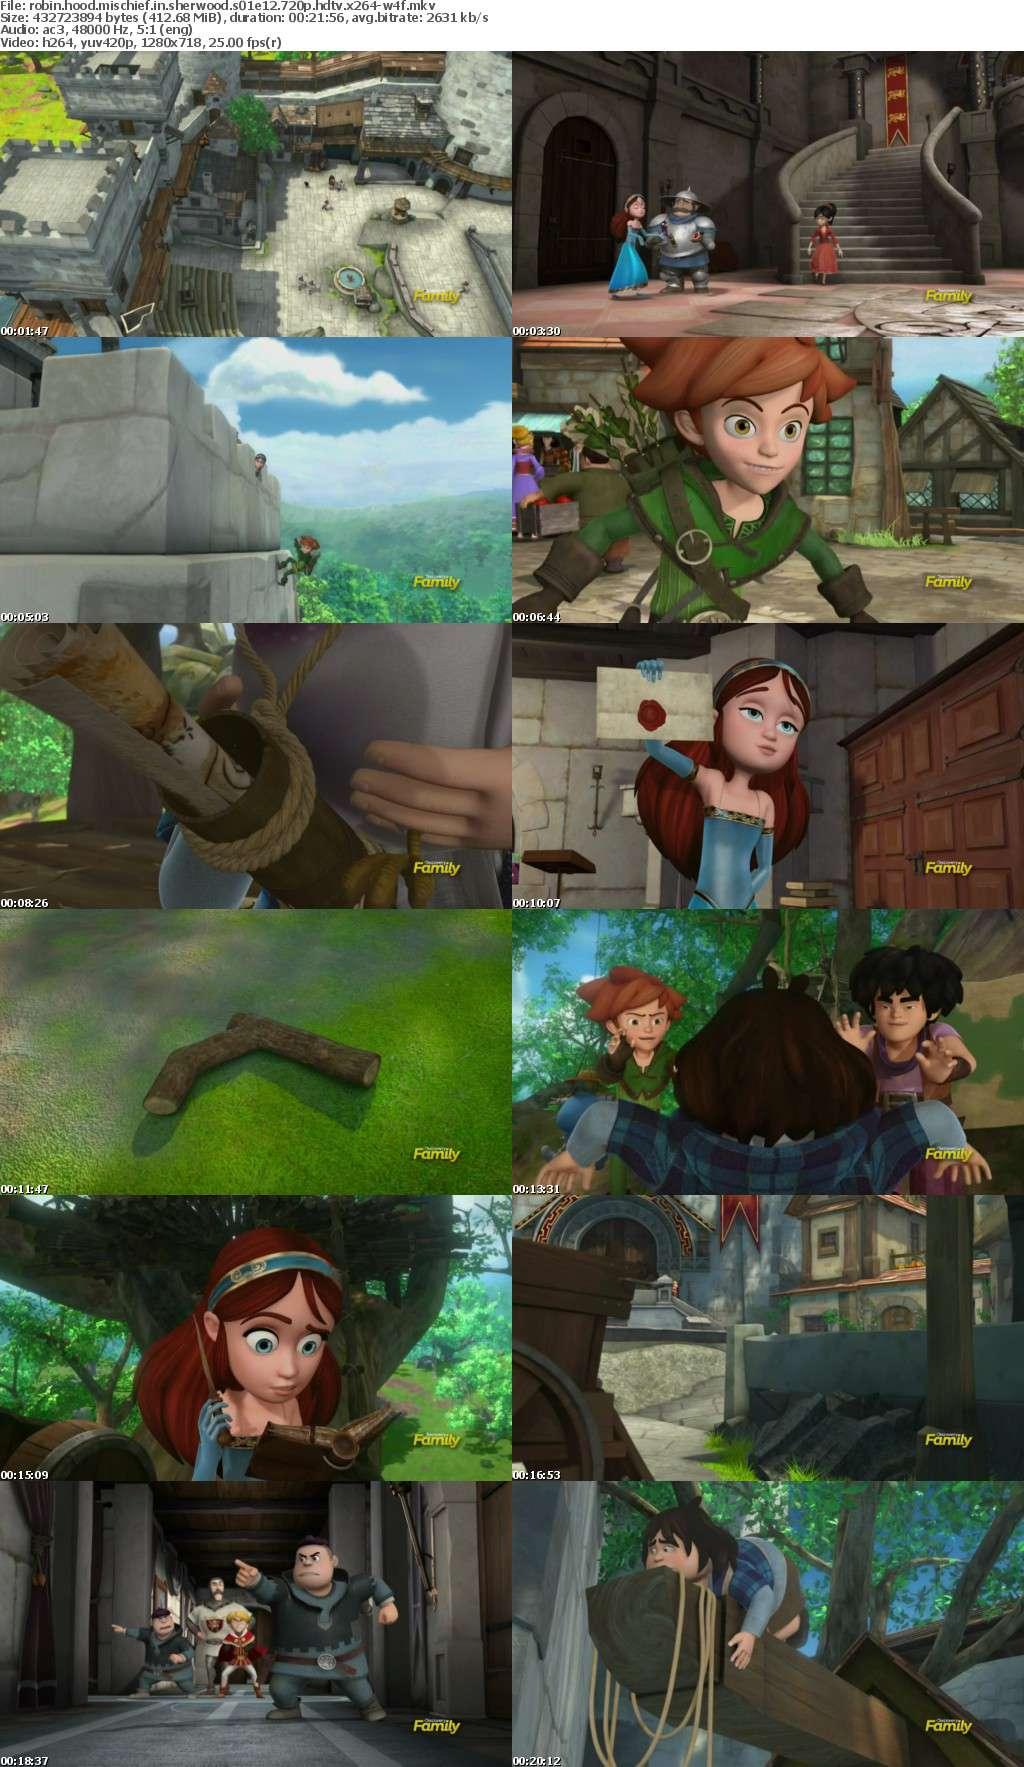 Robin Hood Mischief in Sherwood S01E12 720p HDTV x264-W4F